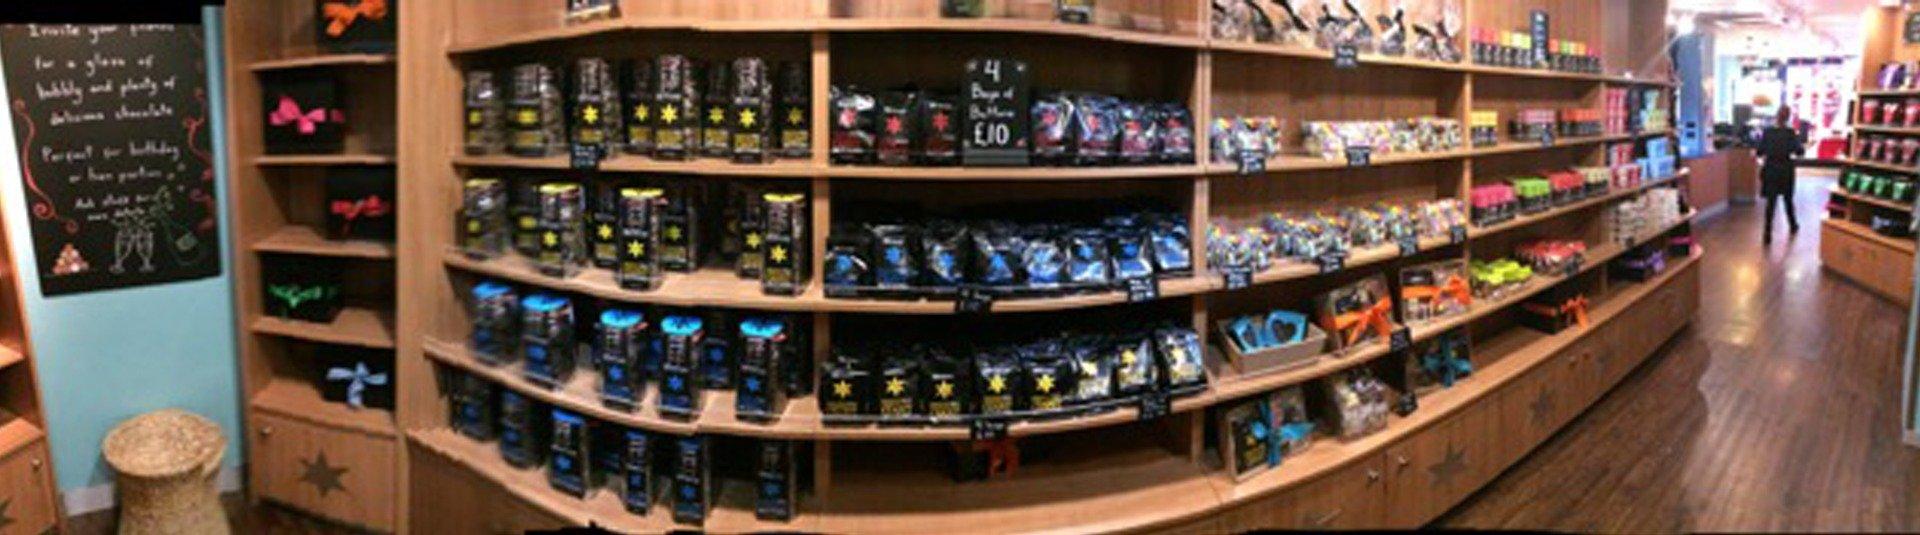 Our London Kingston store